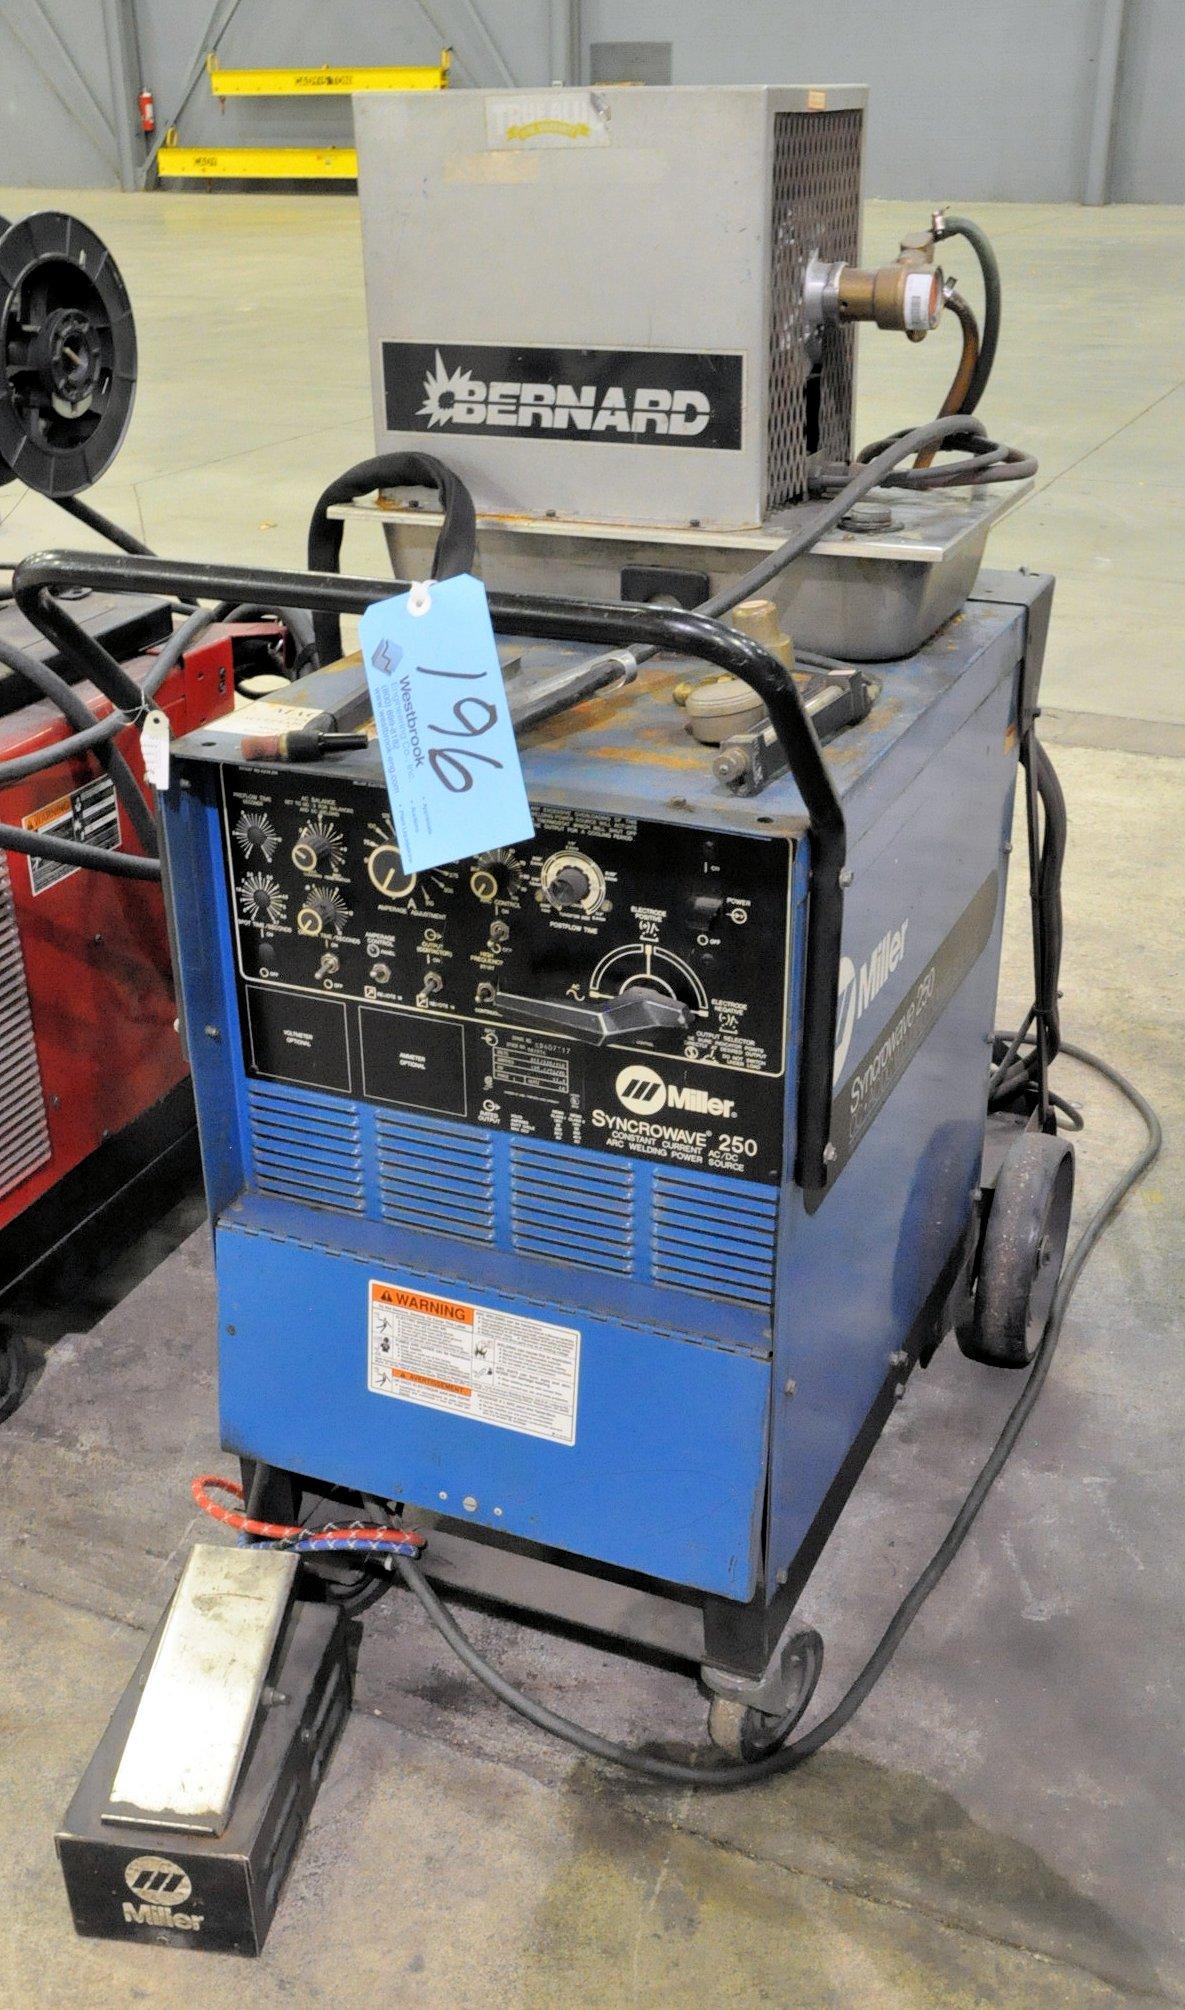 Miller Syncrowave 250, 250-Amp Capacity CC AC/DC Tig Welding